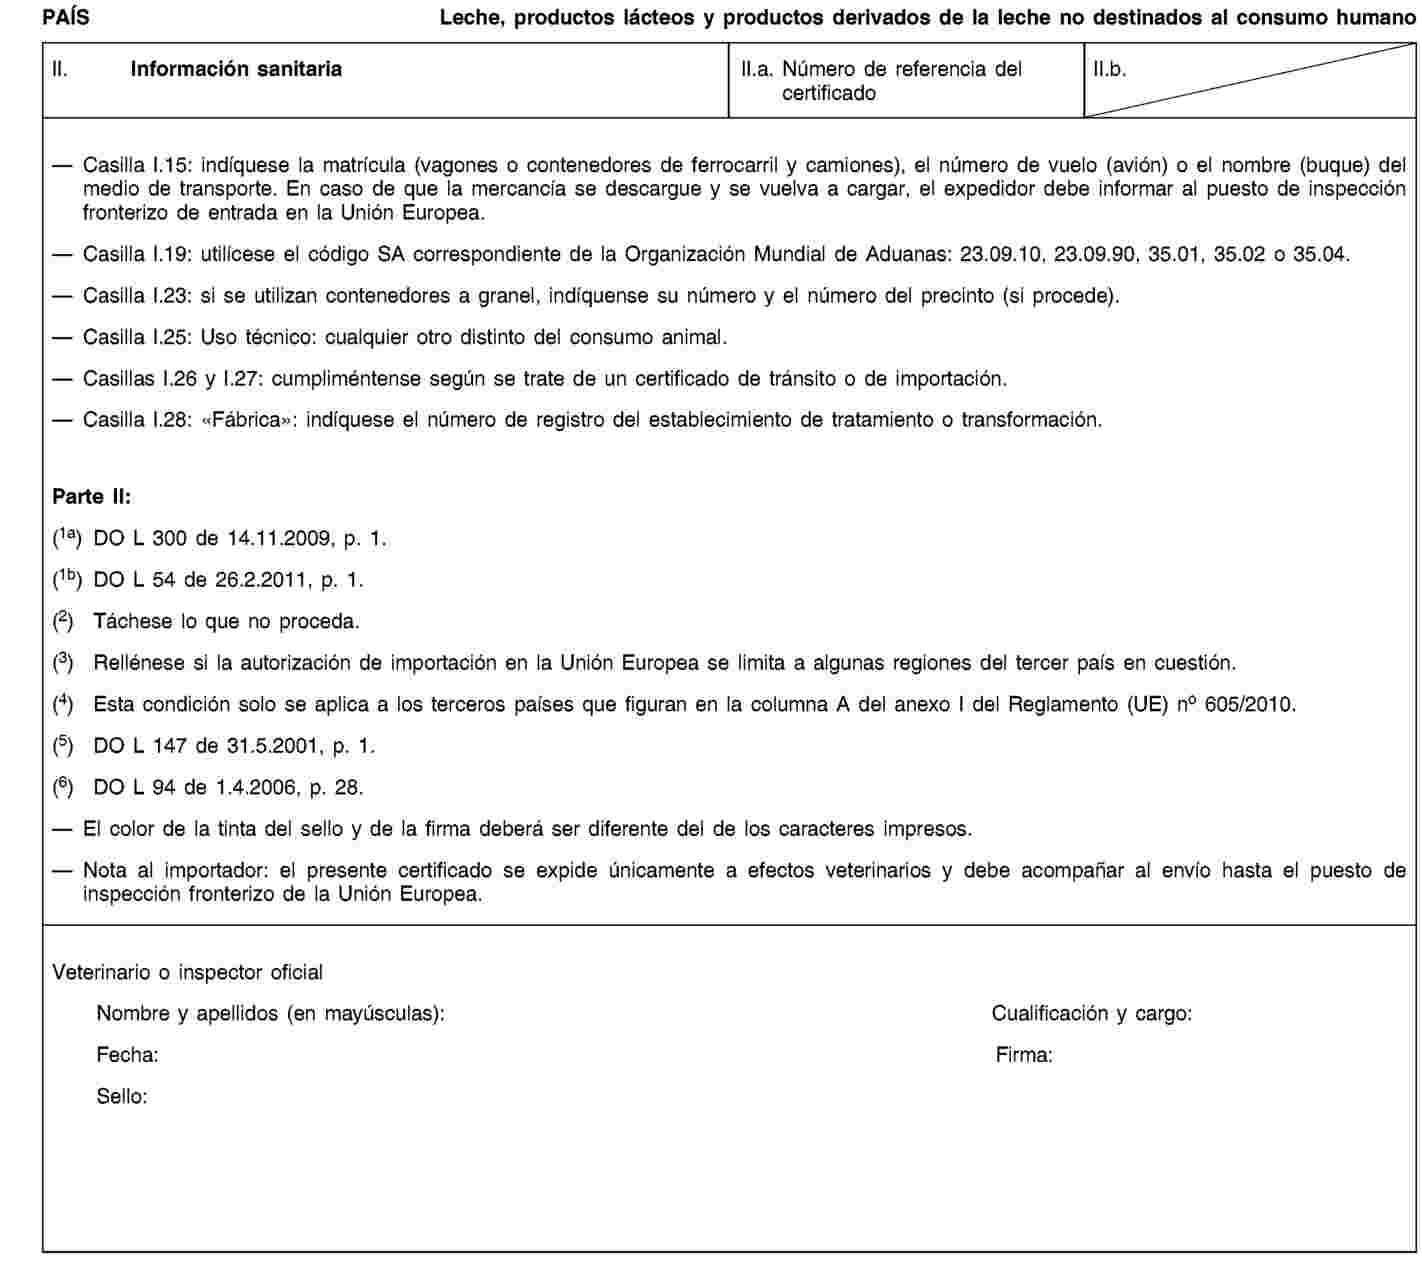 Imagen: https://eur-lex.europa.eu/resource.html?uri=uriserv:OJ.L_.2011.054.01.0001.01.SPA.xhtml.L_2011054ES.01012701.tif.jpg